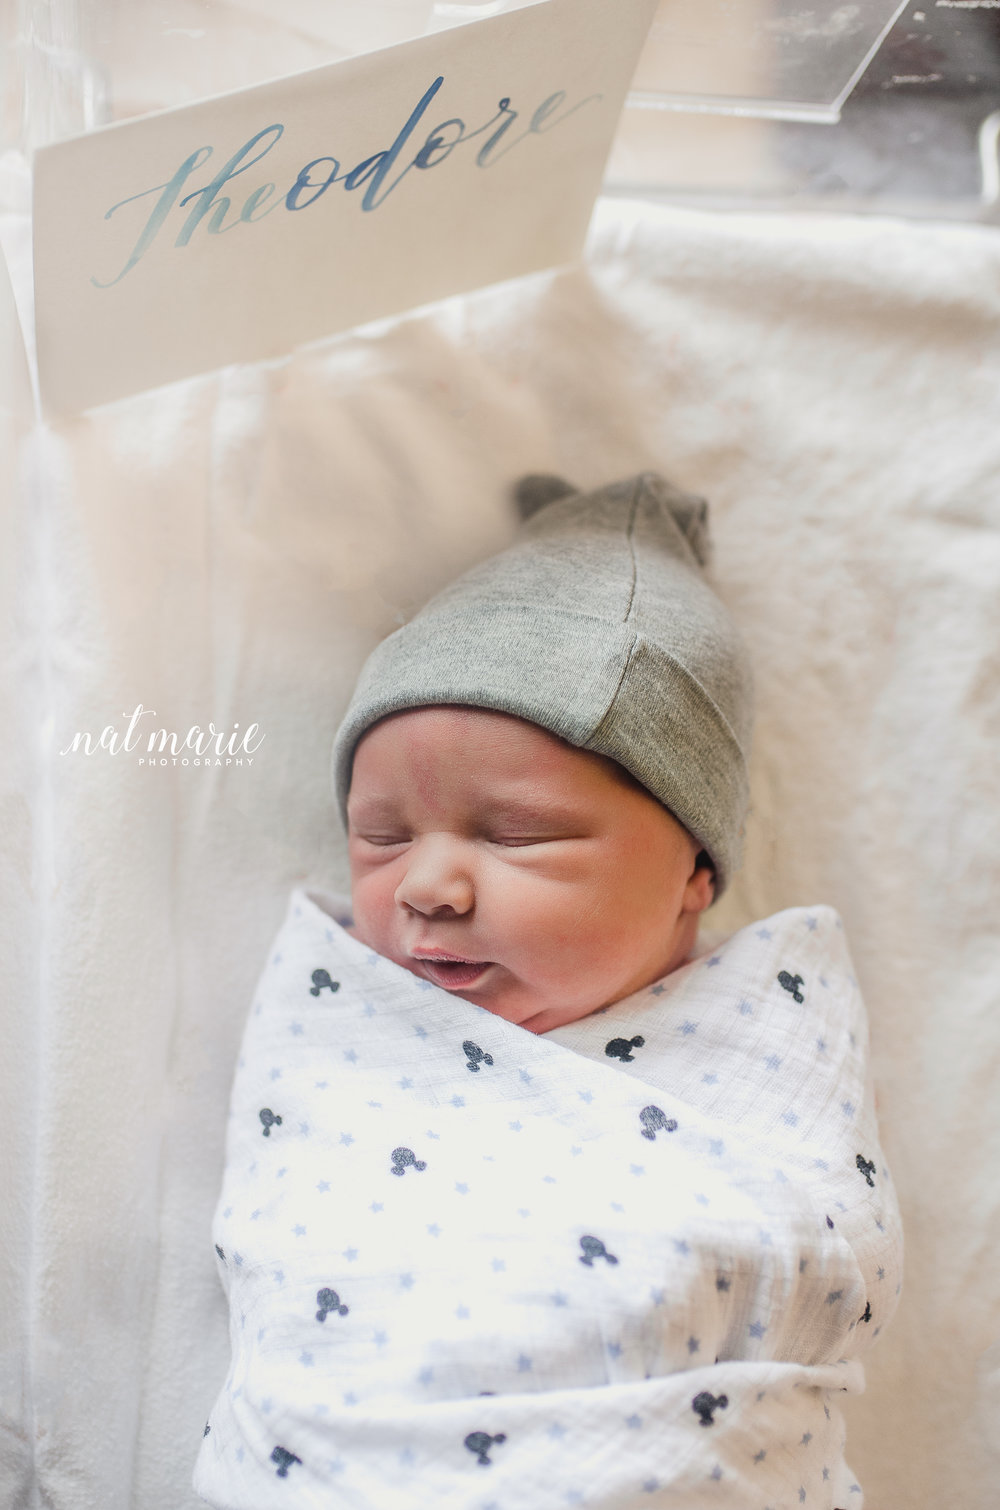 Gilbert, AZ Hospital Fresh 48 Newborn Photographer - Authentic Photography